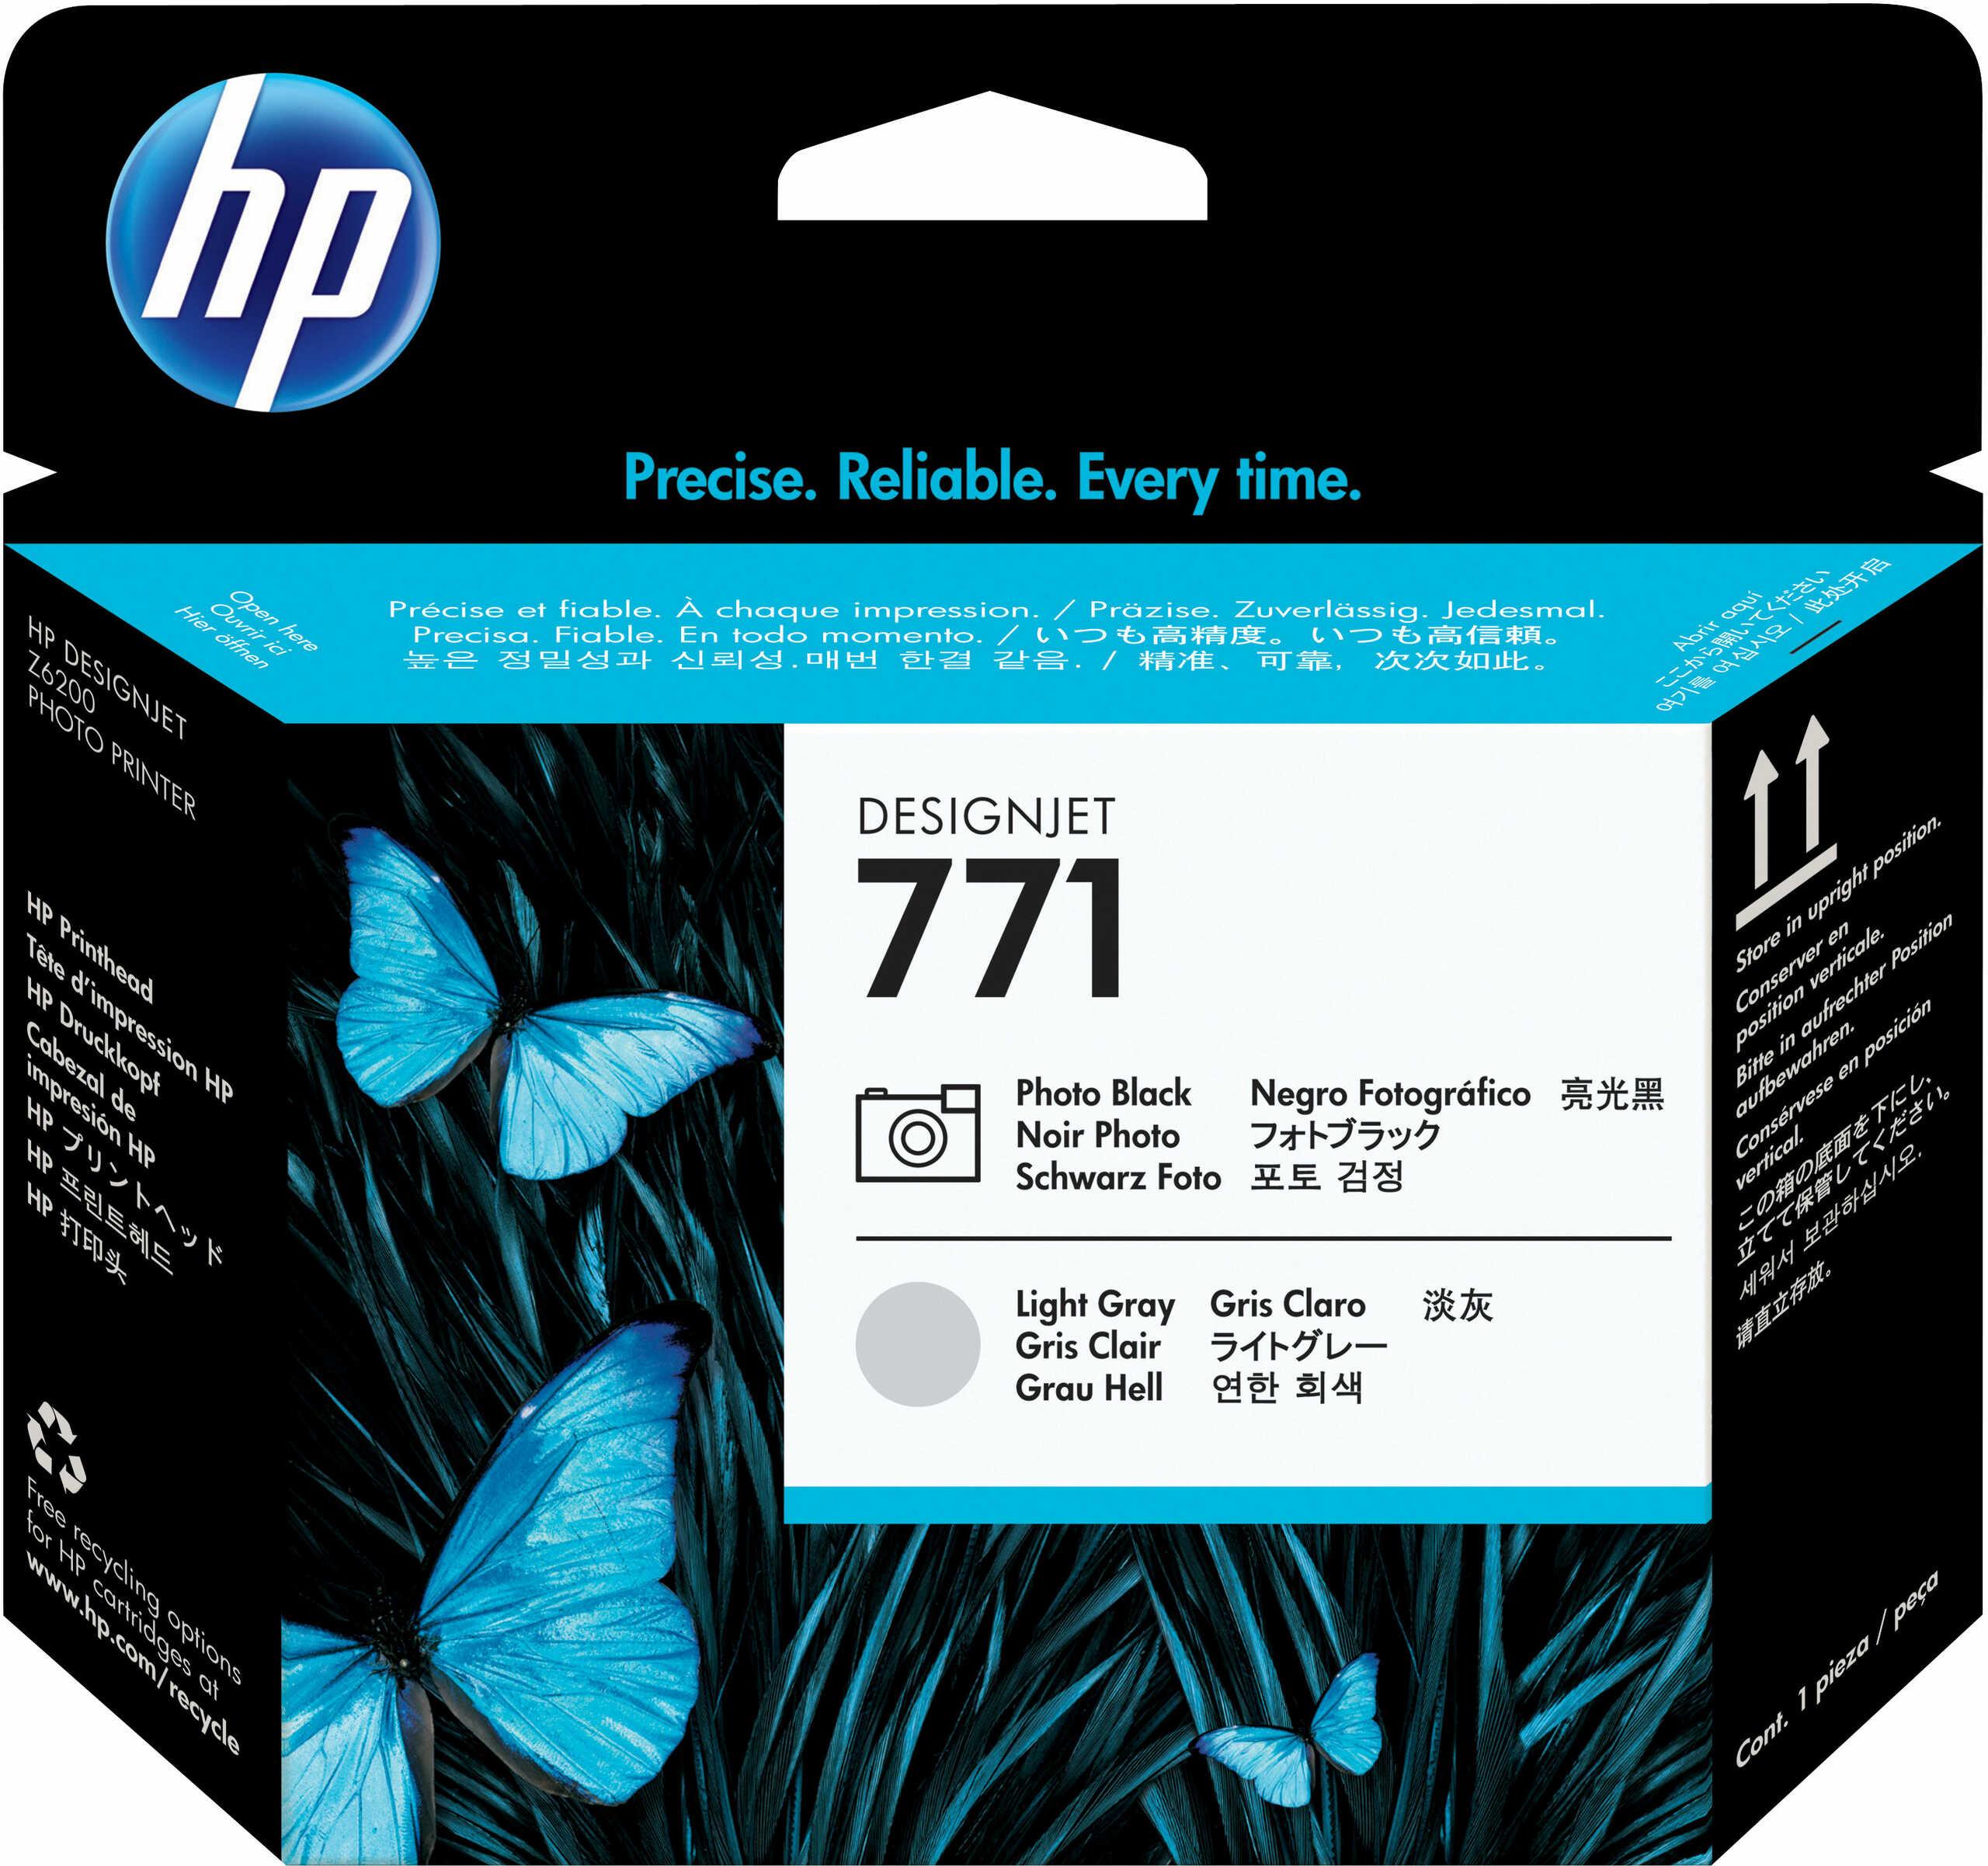 HP 771 głowica do drukarki Atramentowa